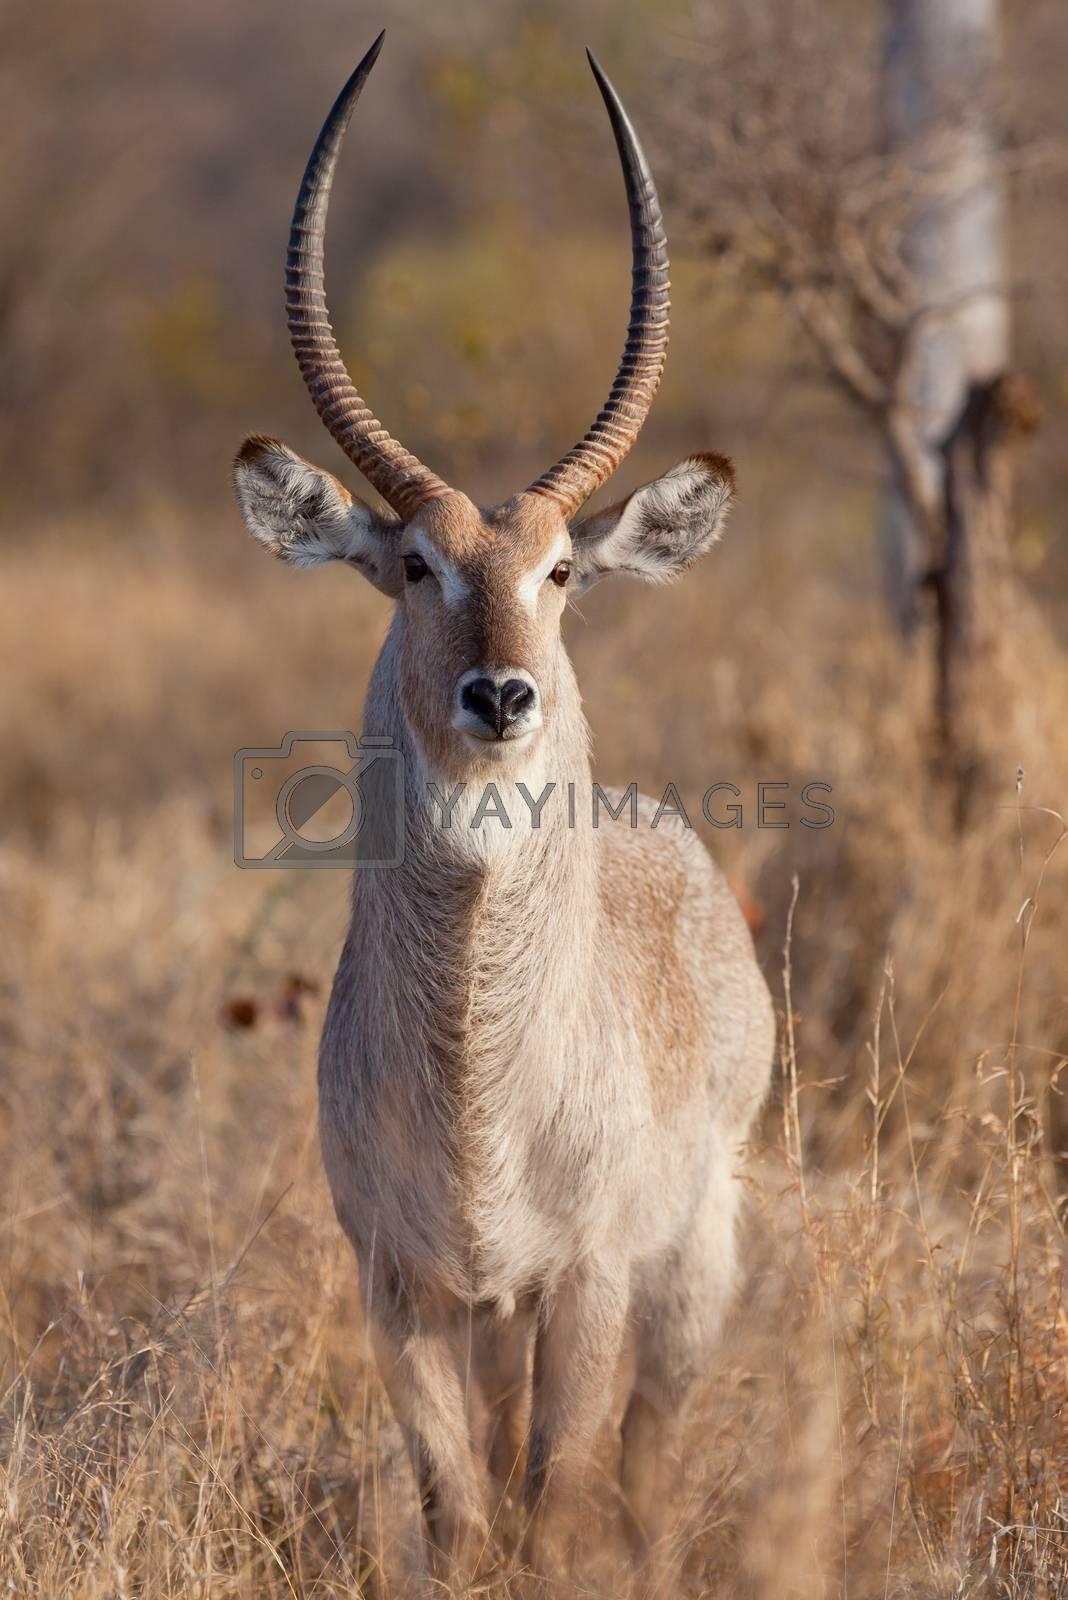 impala in the wild